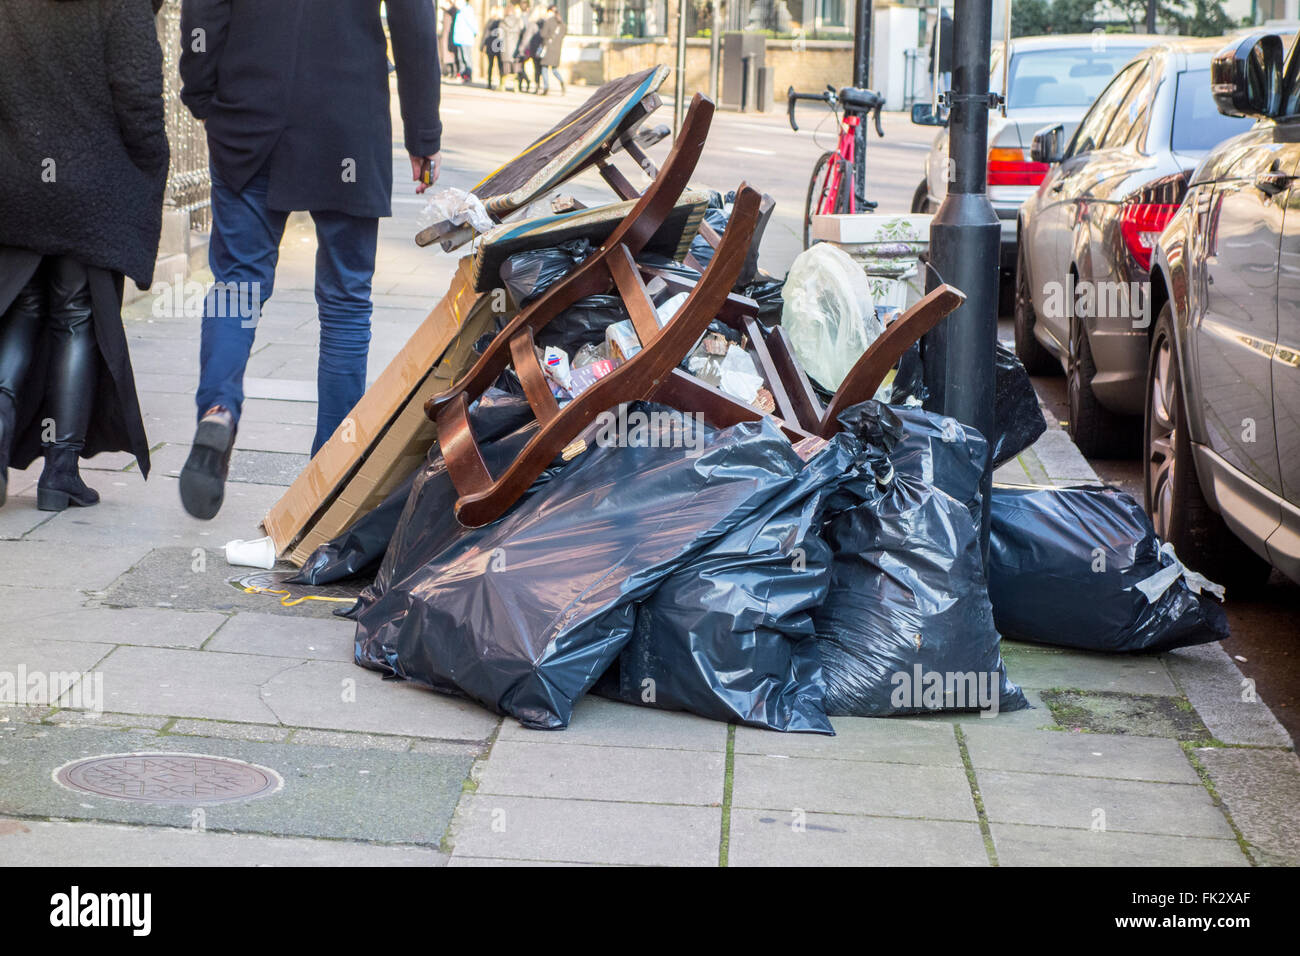 Bags of rubbish on Old Marylebone Road, London, UK - Stock Image